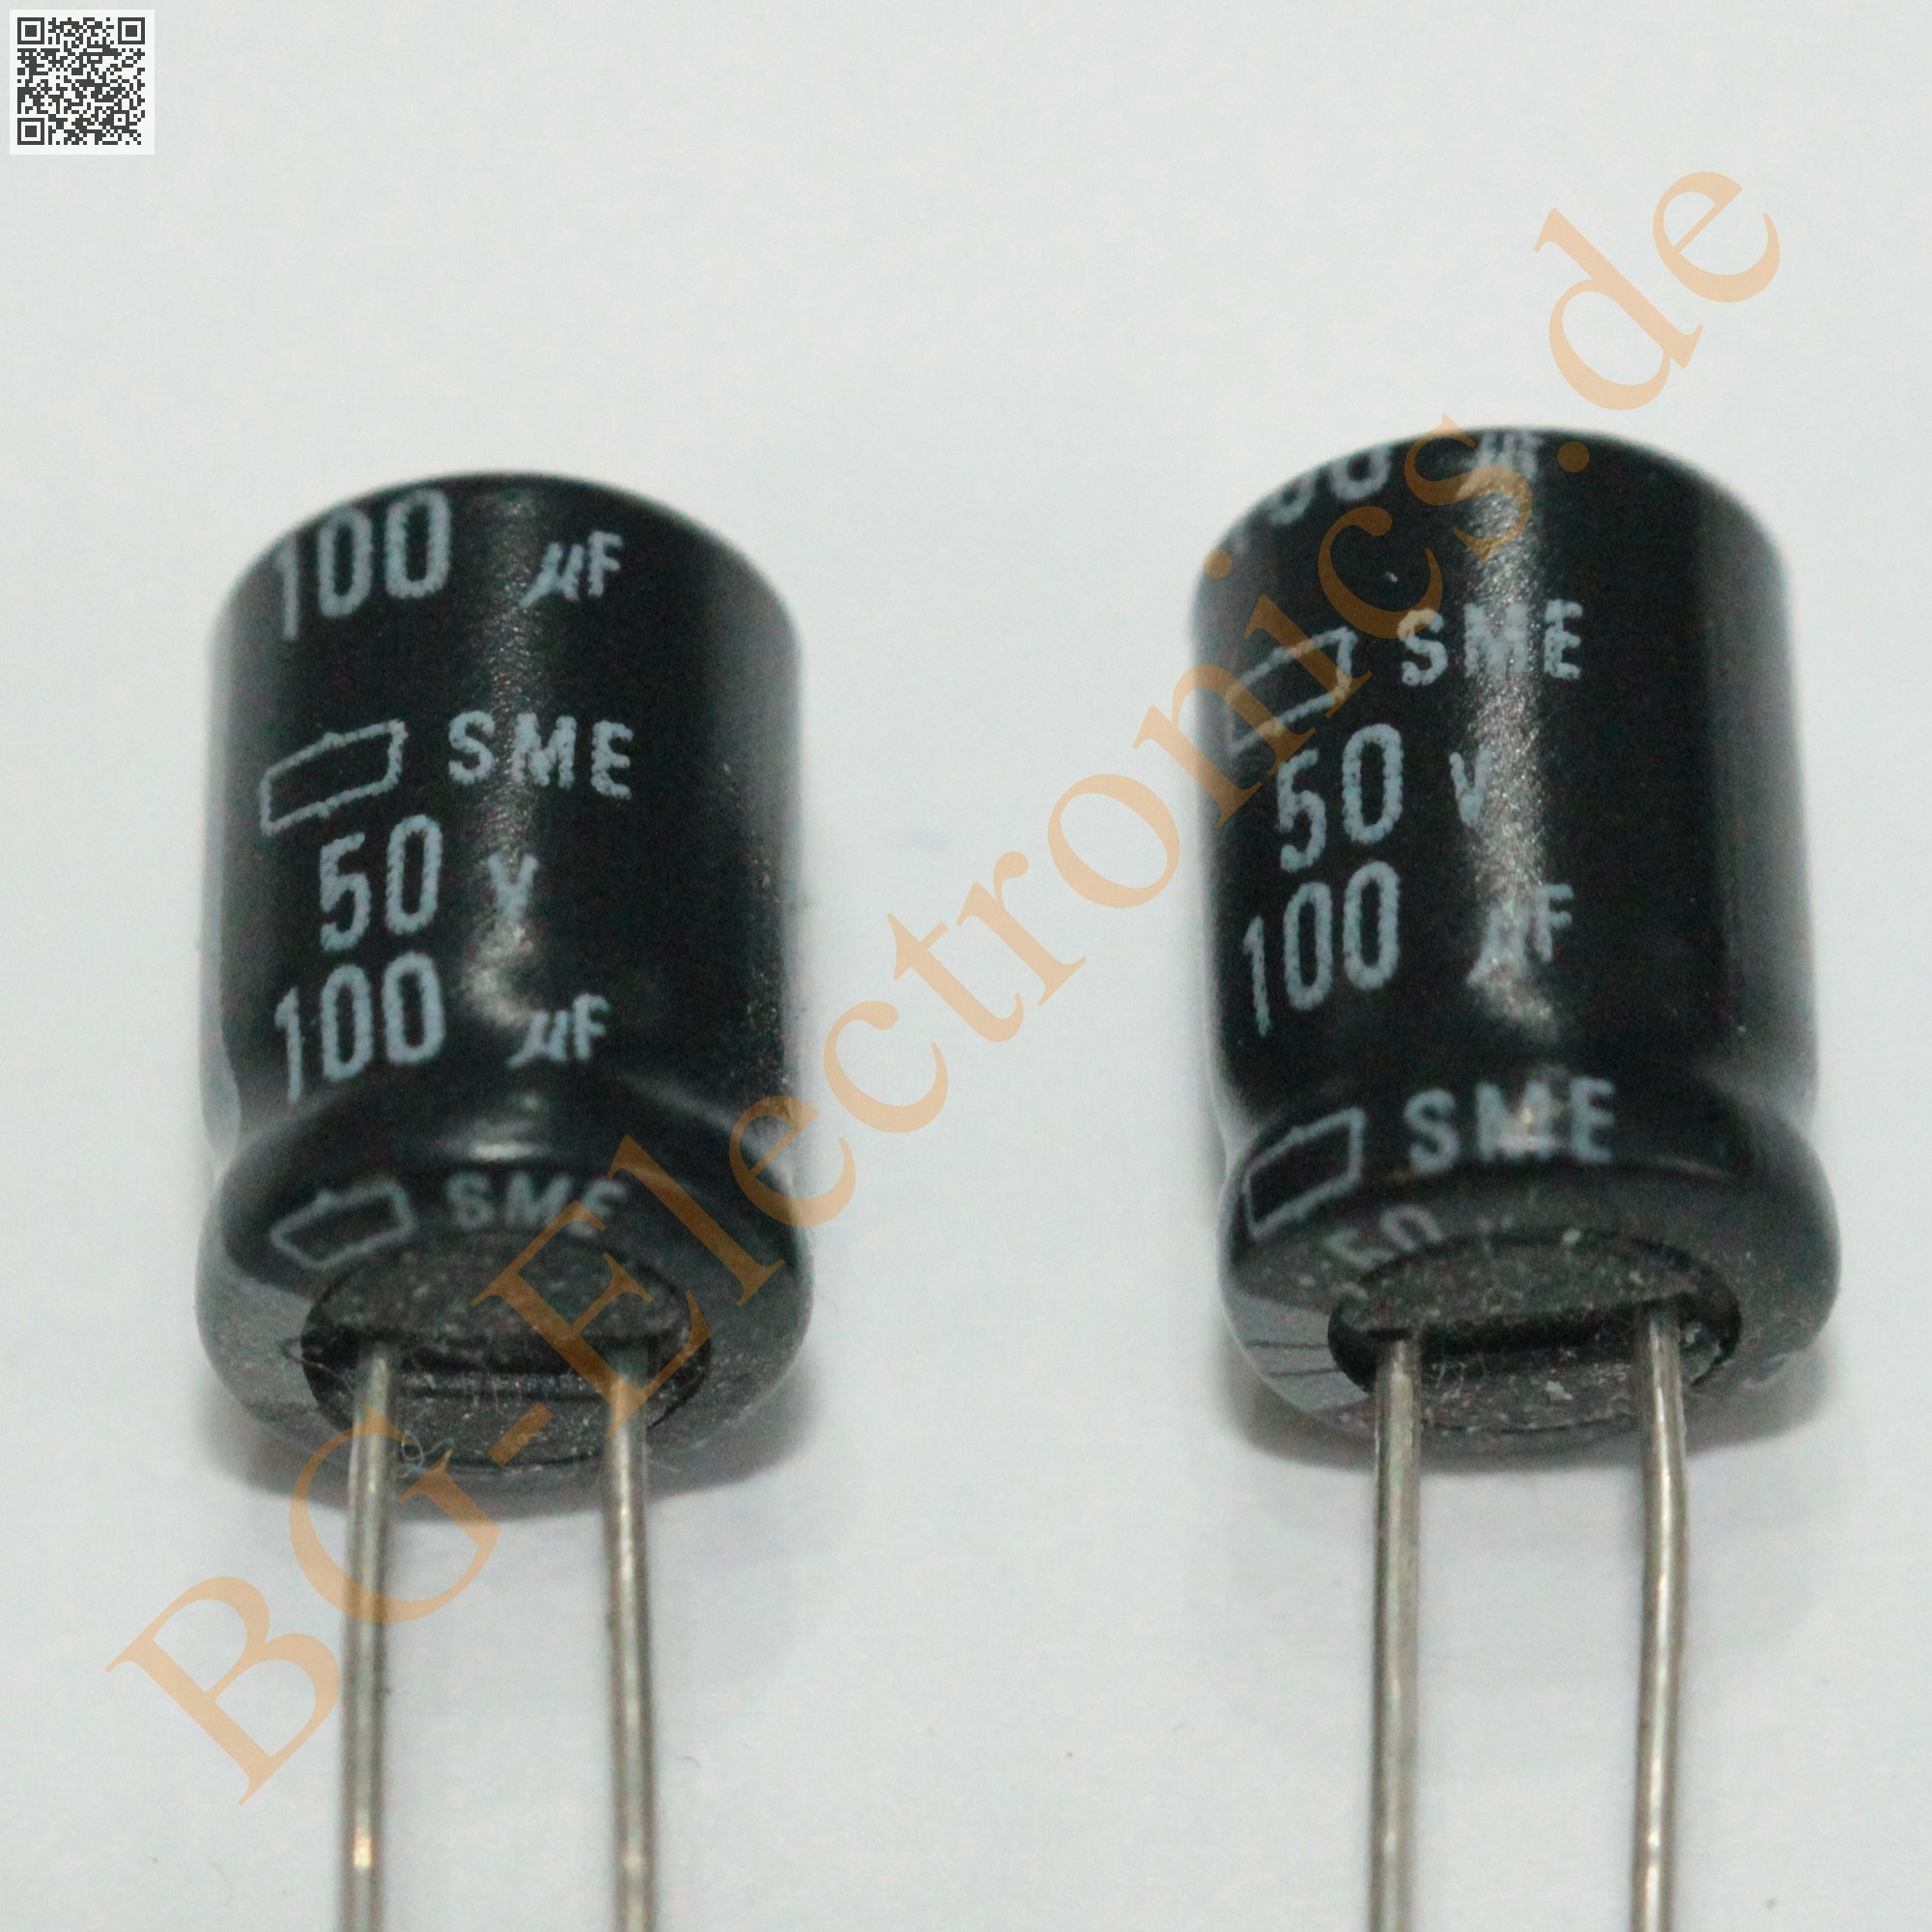 5 x 100µF 100uF 50V 85° RM3.5 Elko Kondensator Capacitor Radi Nippon Ch  5pcs